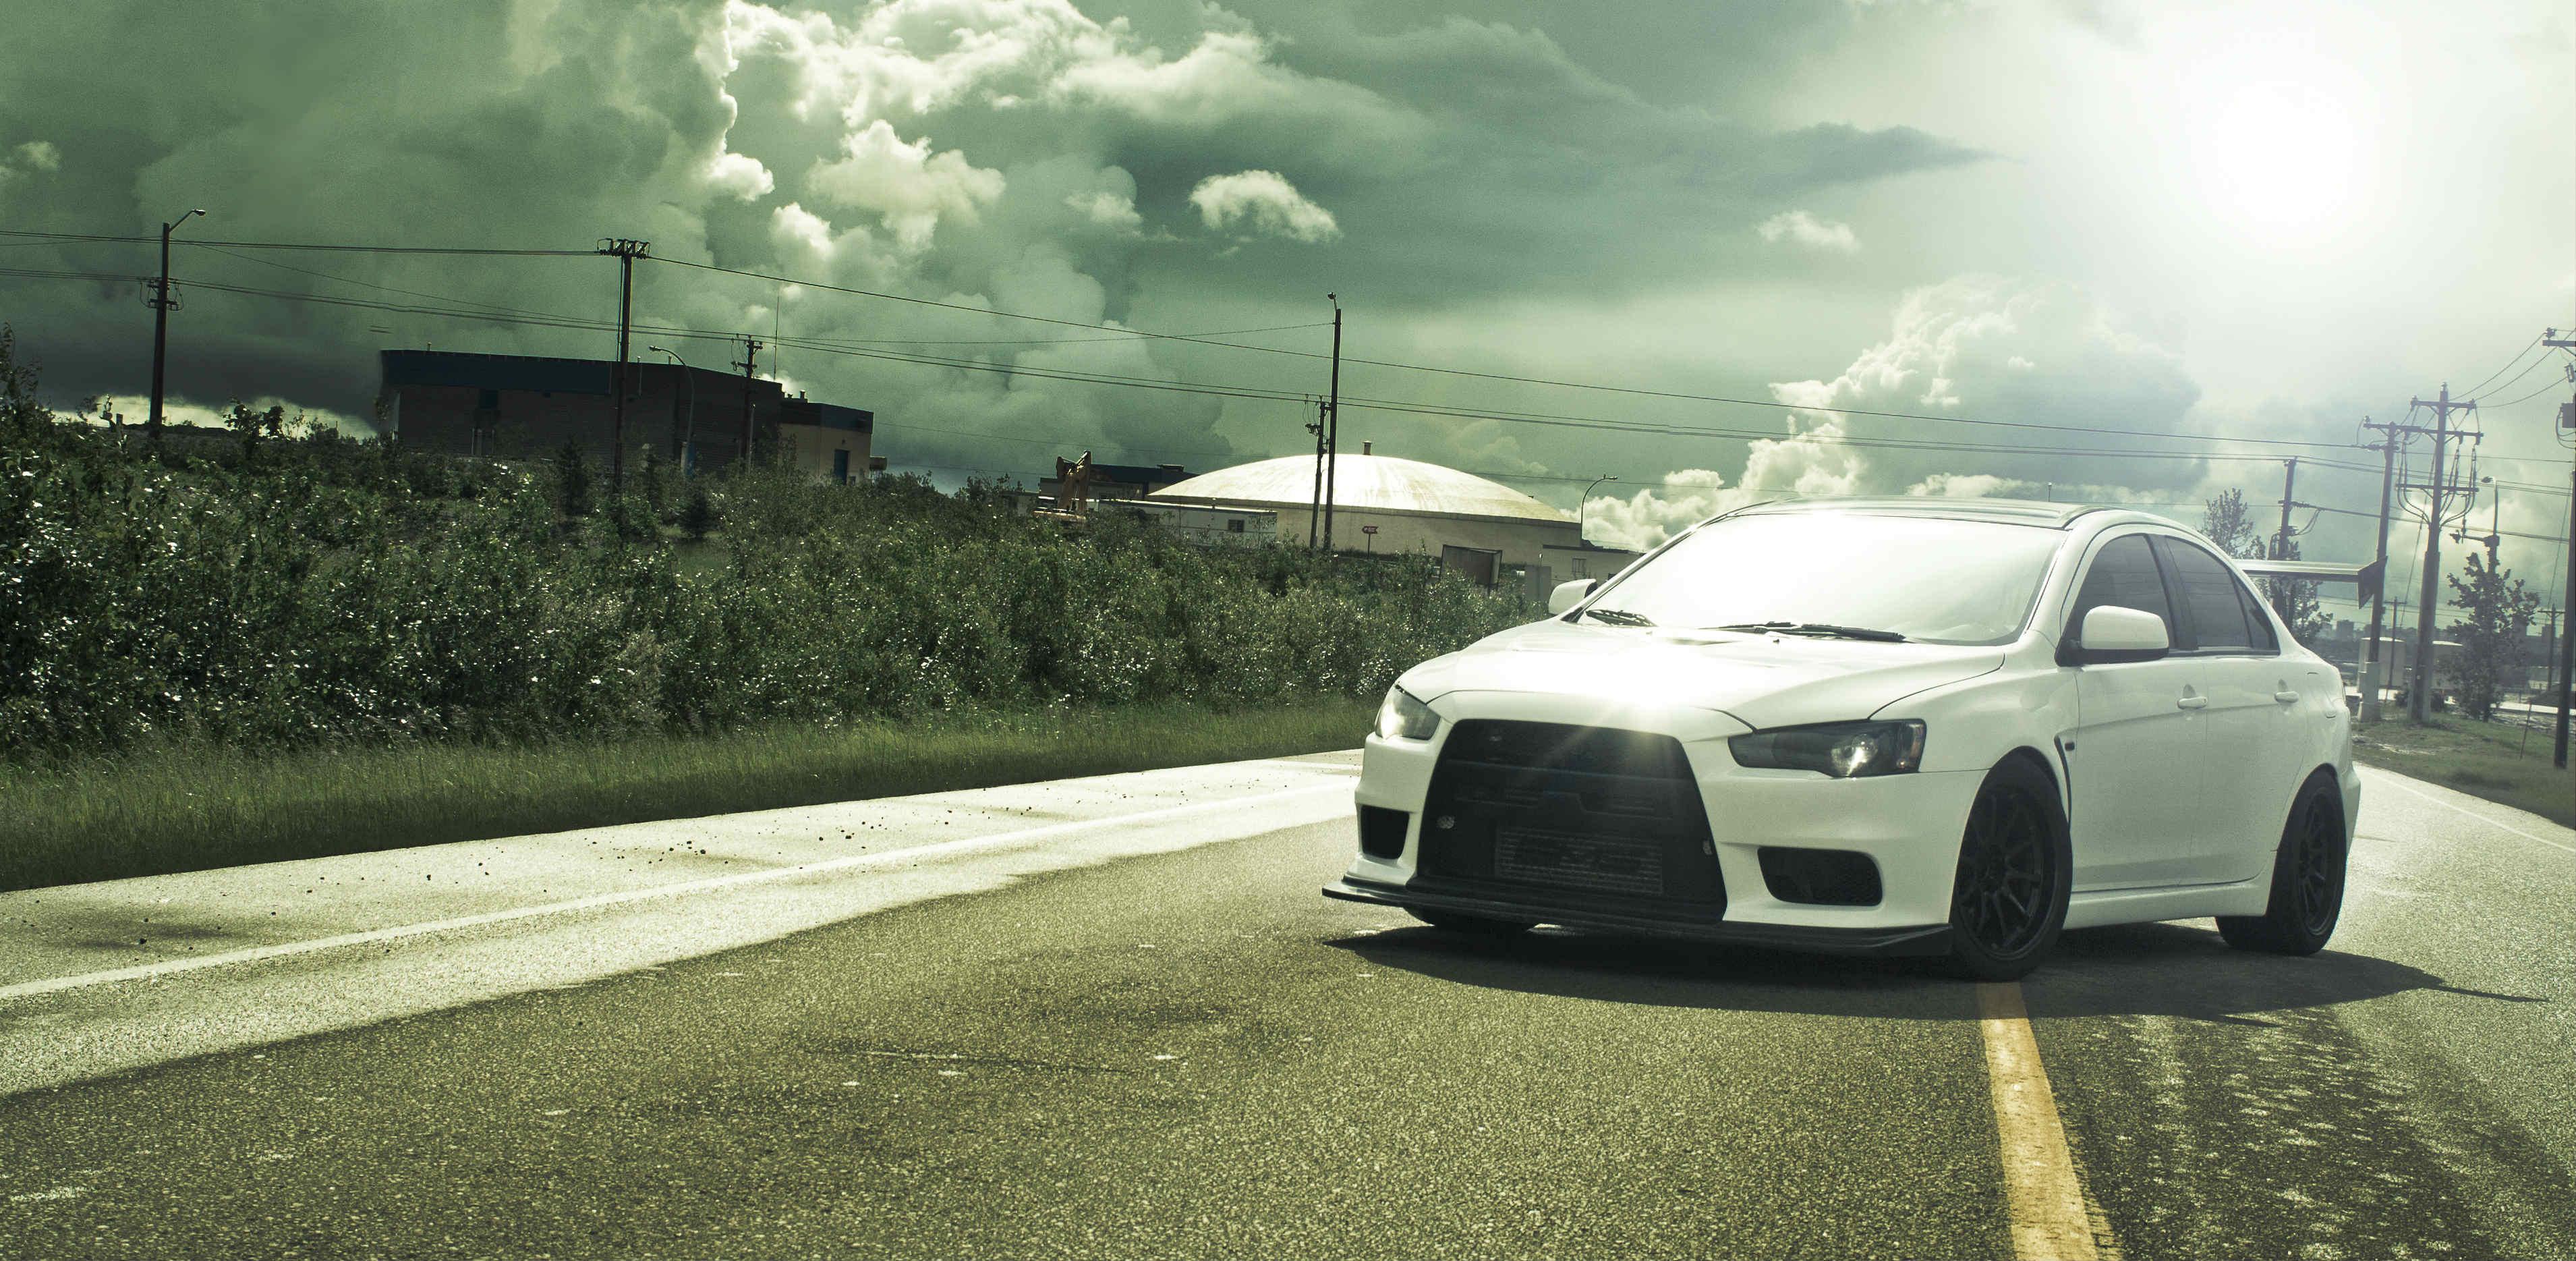 2014 mitsubishi lancer evolution x car wallpaper hd - Mitsubishi Lancer Evolution 2014 Wallpaper